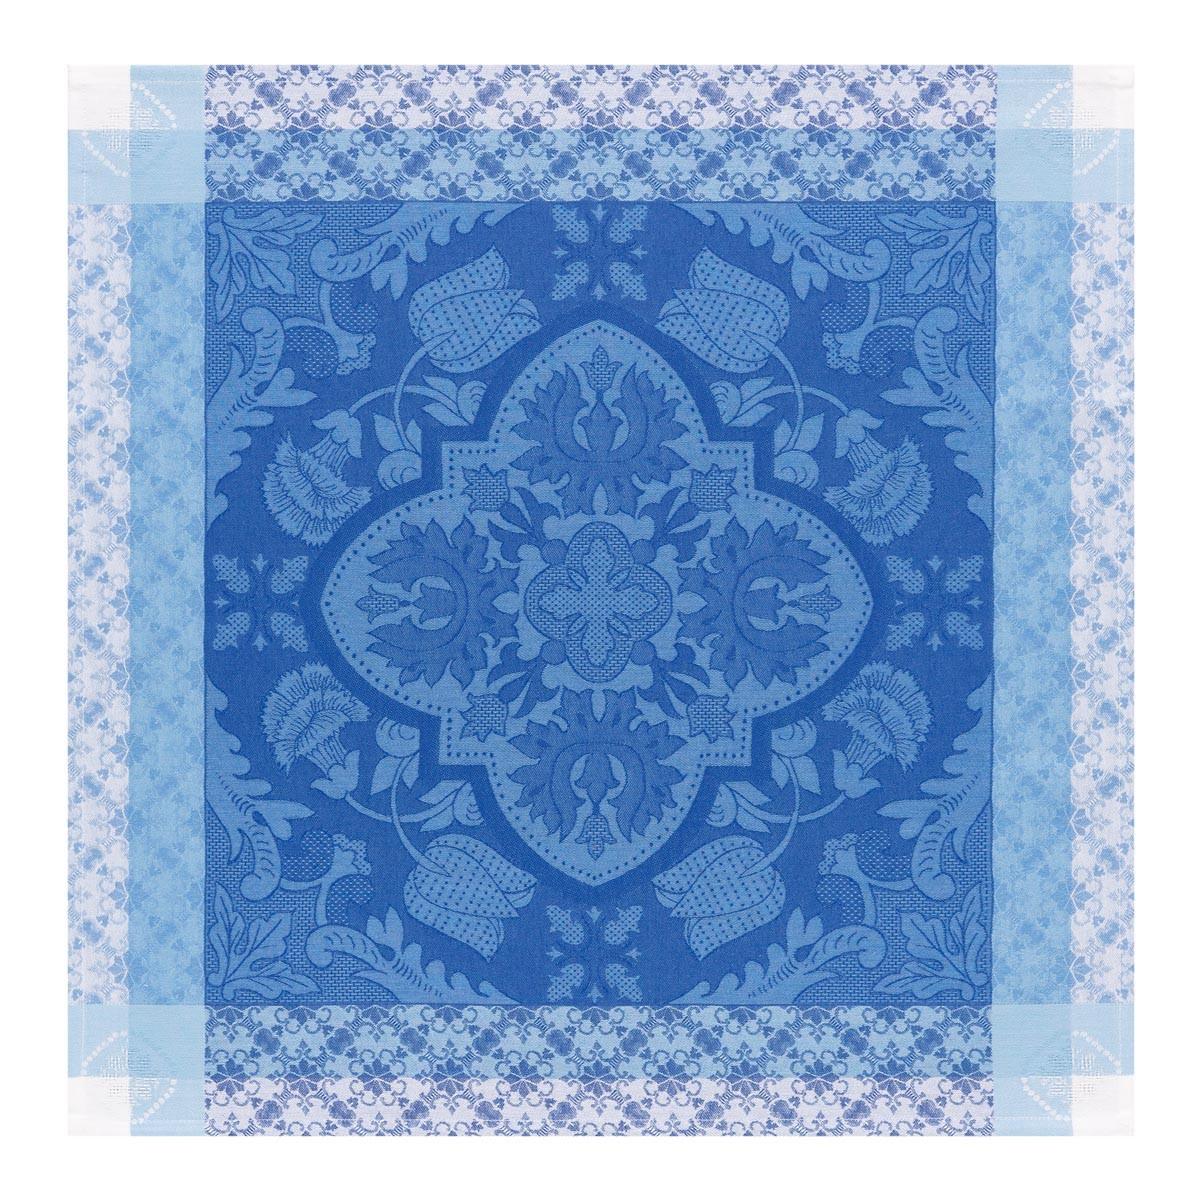 LJF Napkin Azulejos Blue China